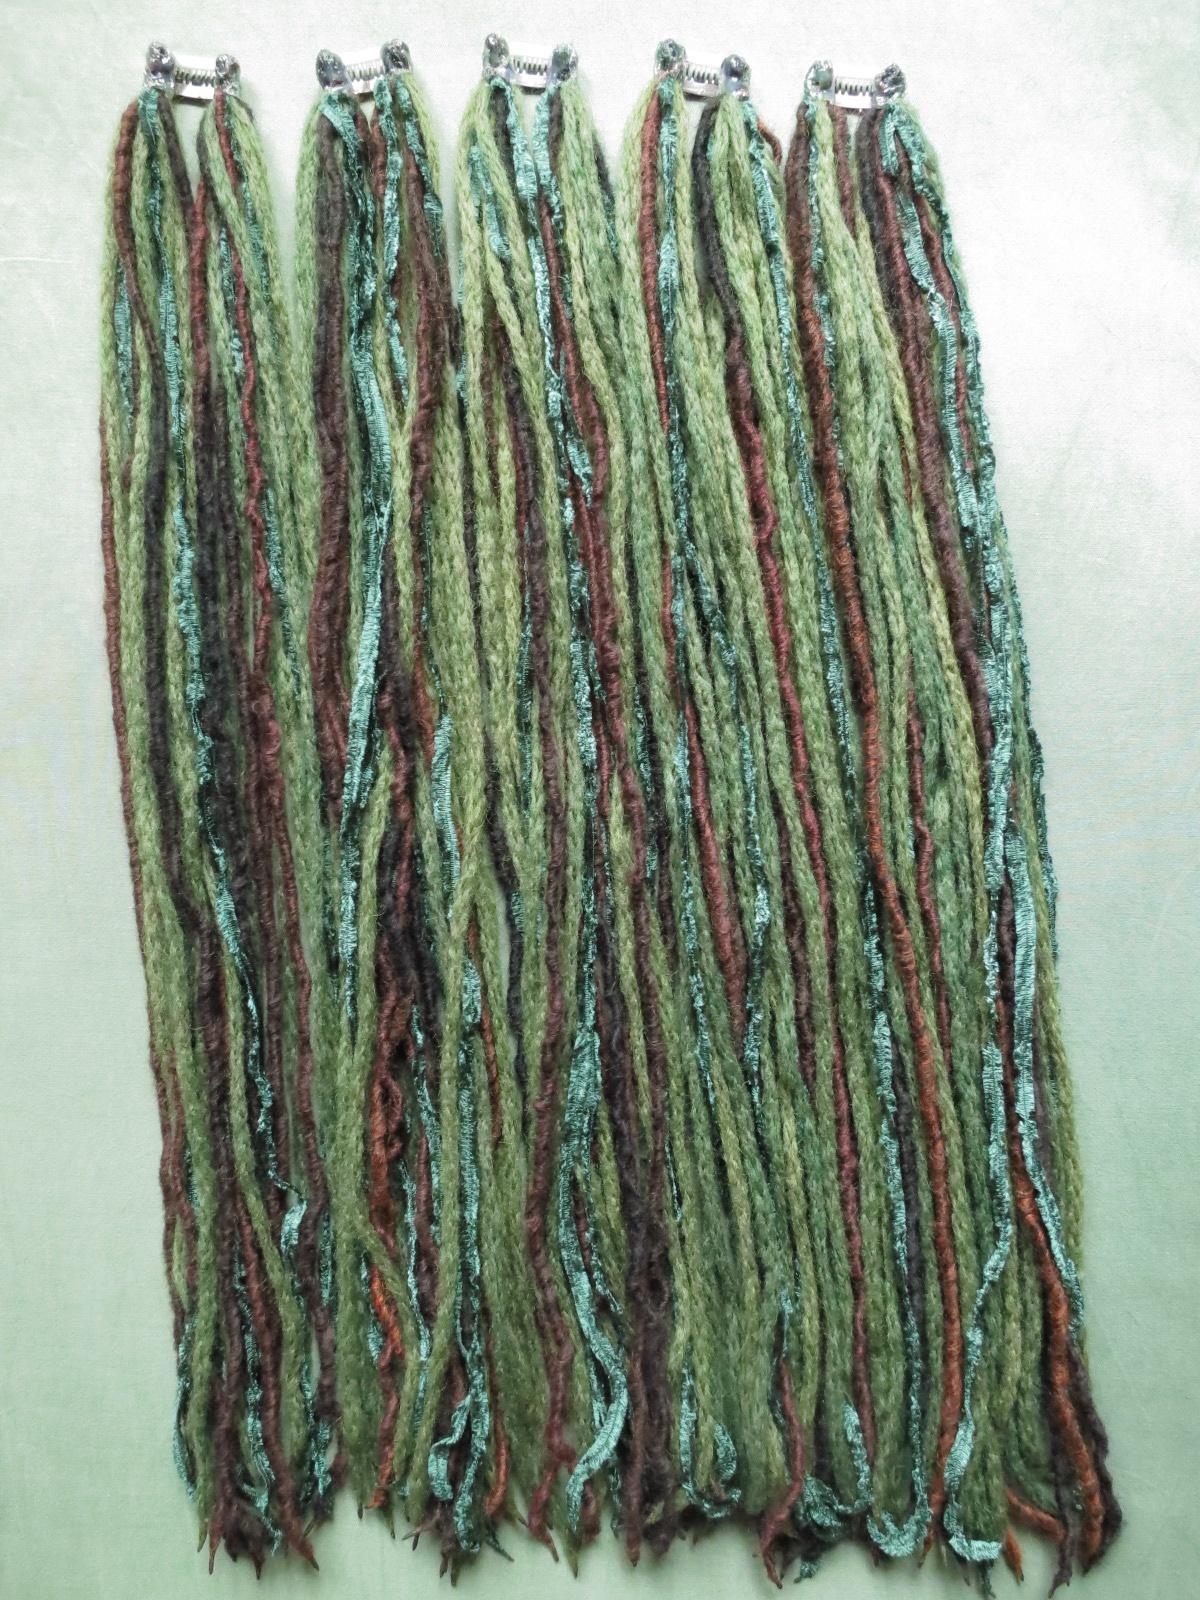 OFCCN 30 Colors Top Roving Dyed Spinning DIY Handcraft Felting Fiber Needlefelting Wool